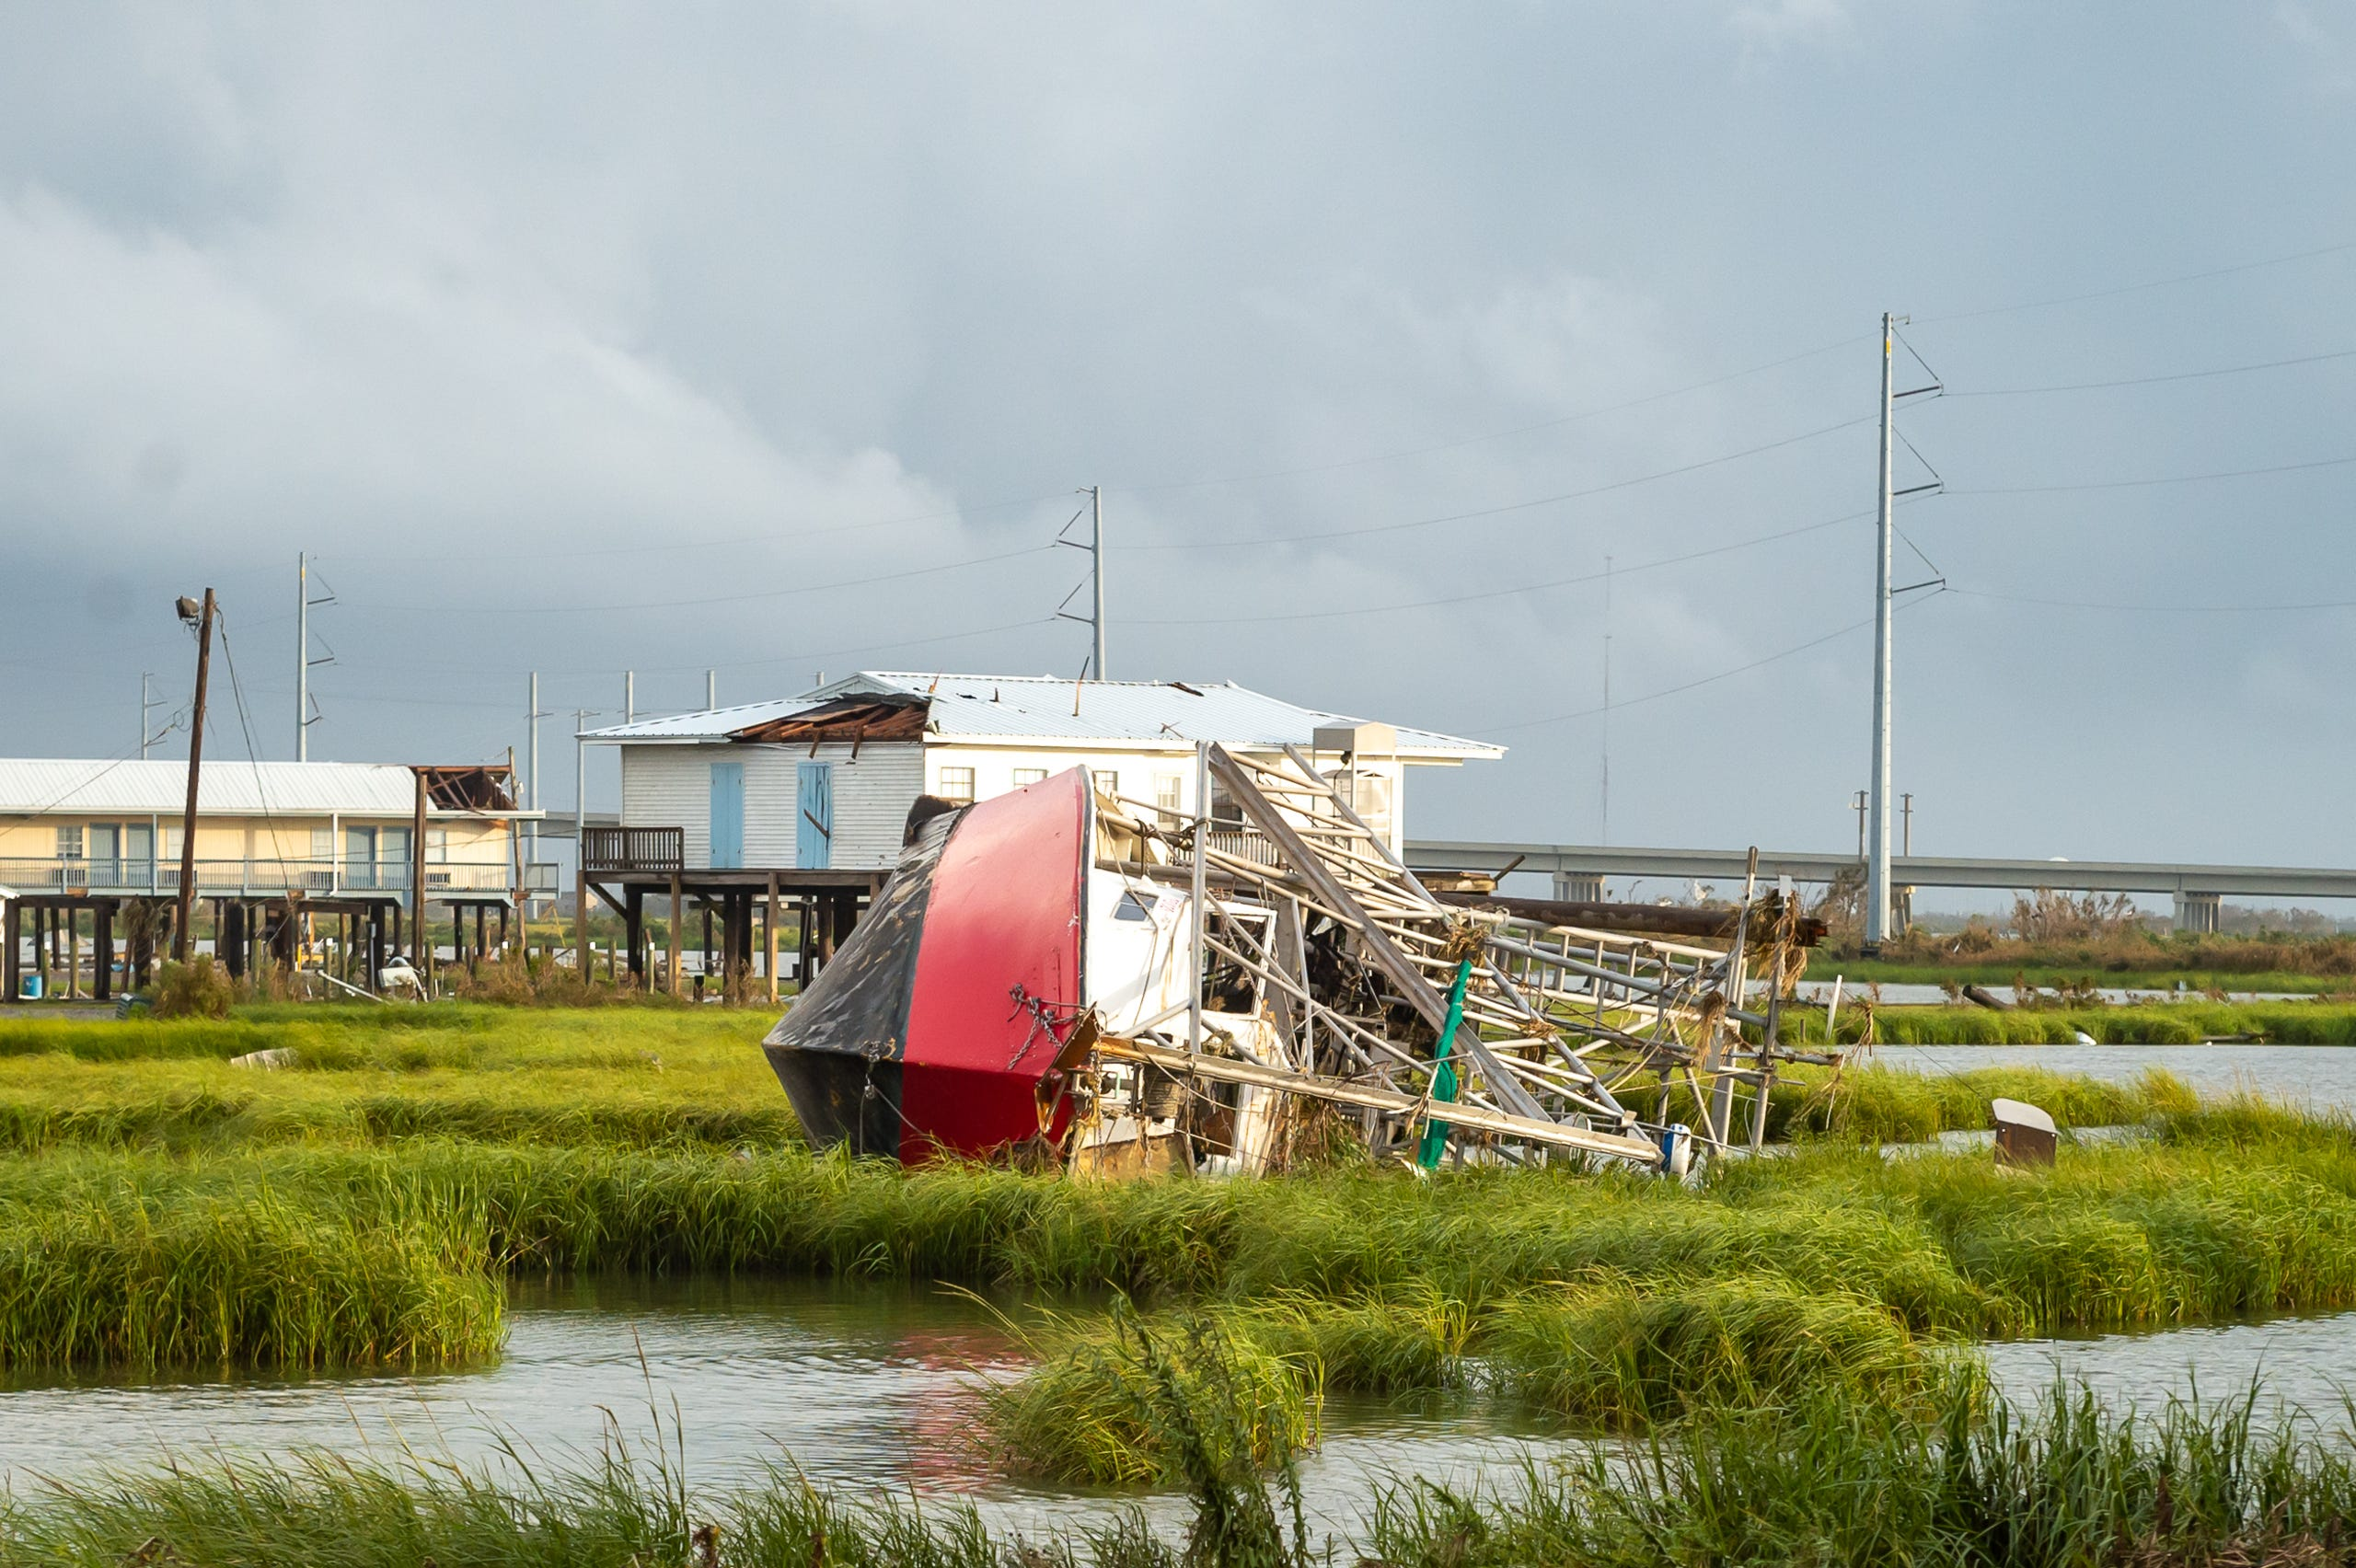 Hurricane Ida leaves destruction behind near Grand Isle, LA. Monday, Aug. 30, 2021.